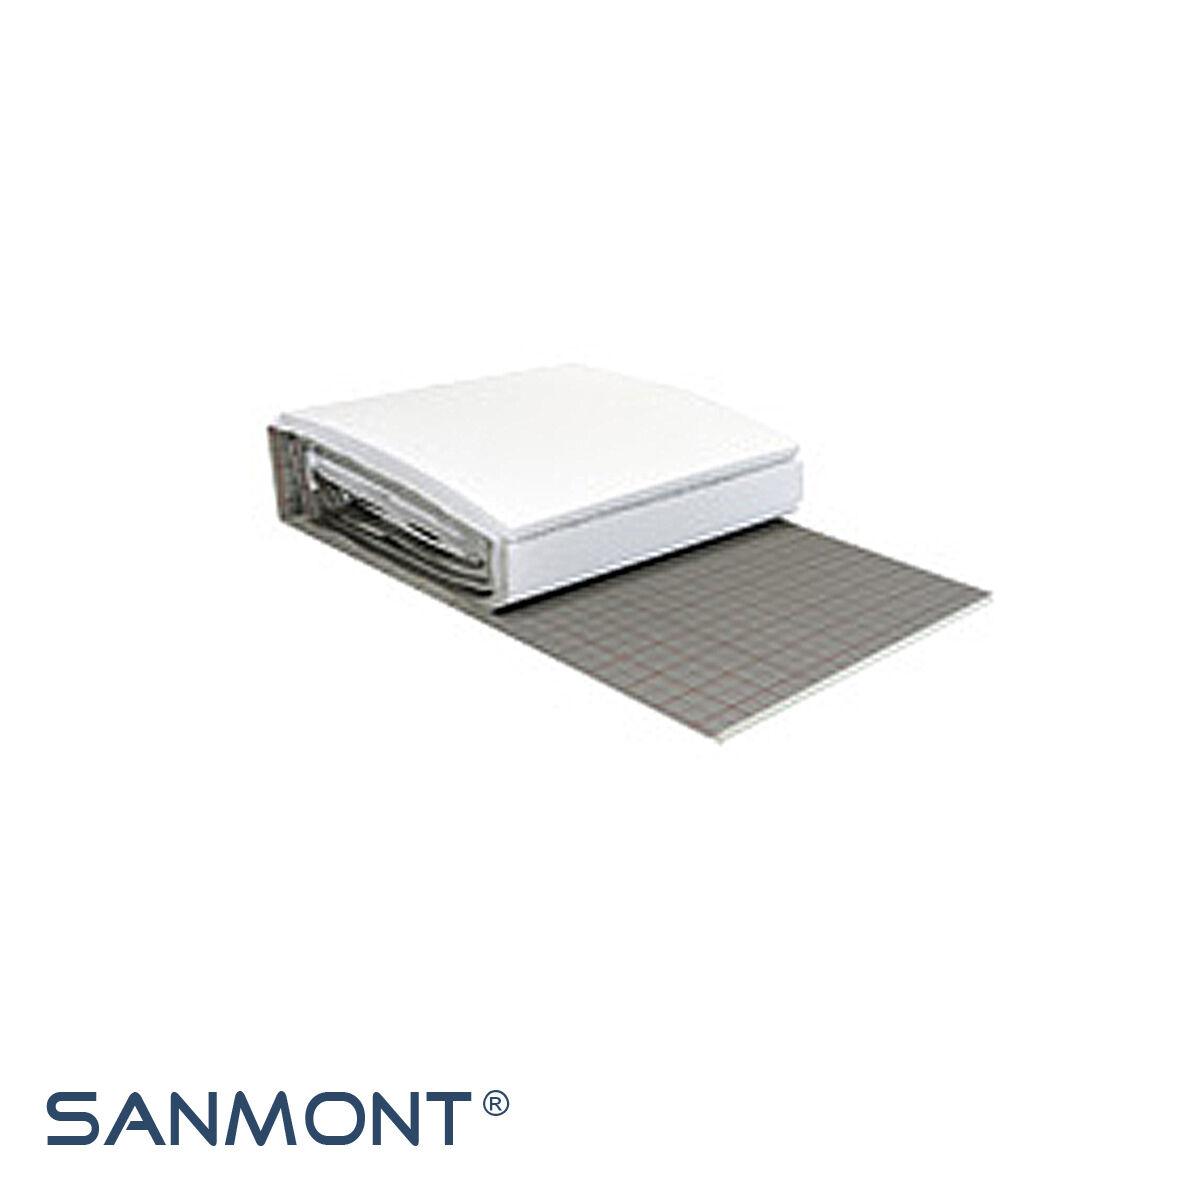 tackerplatte dämmrolle rolljet 5m² fußbodenheizung